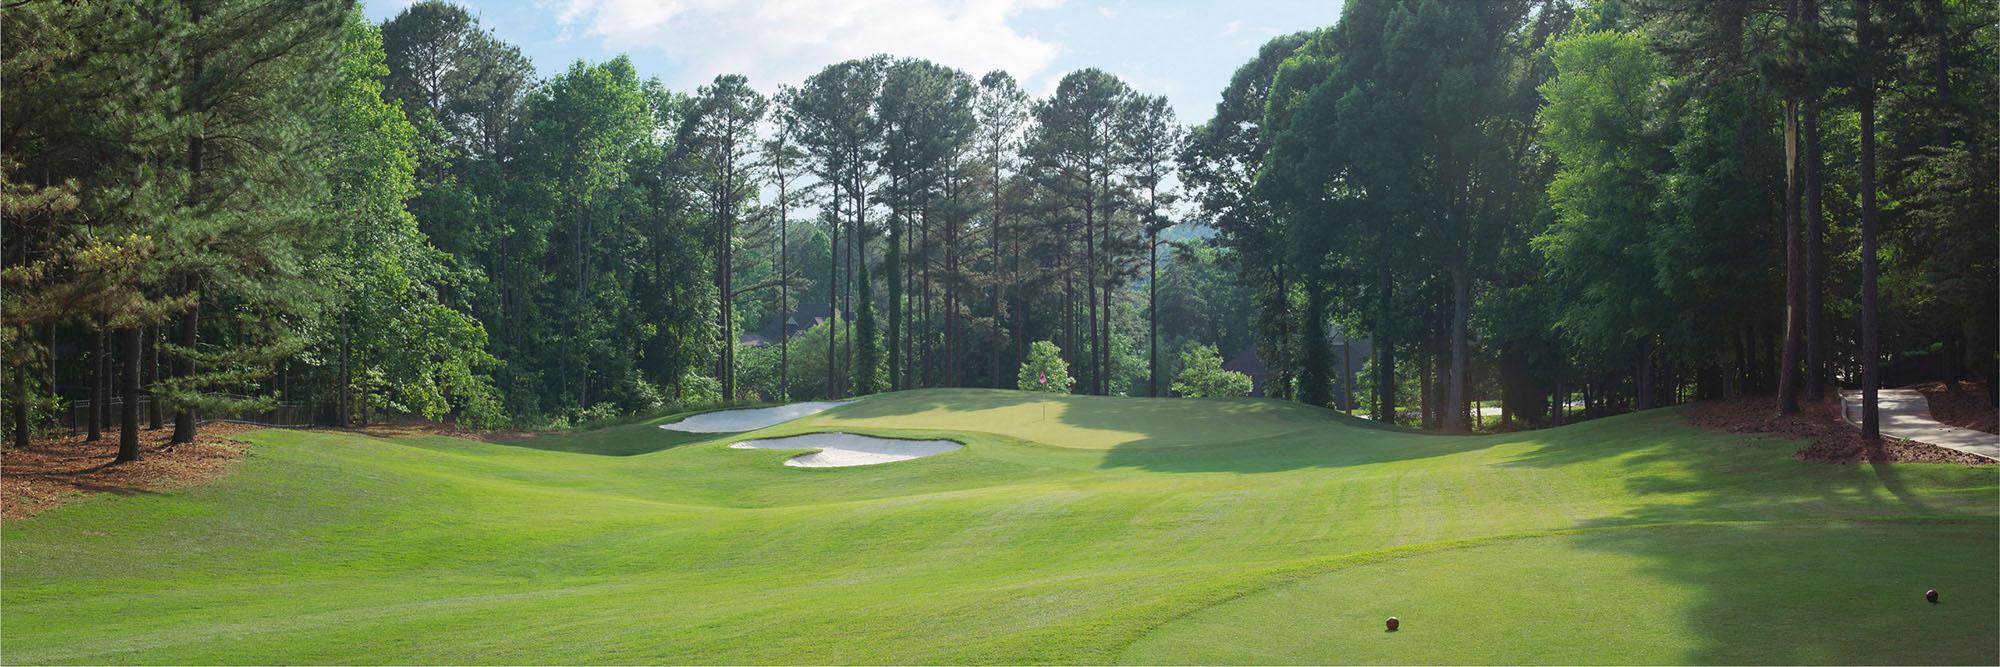 Golf Course Image - Trump National Golf Club Charlotte No. 3